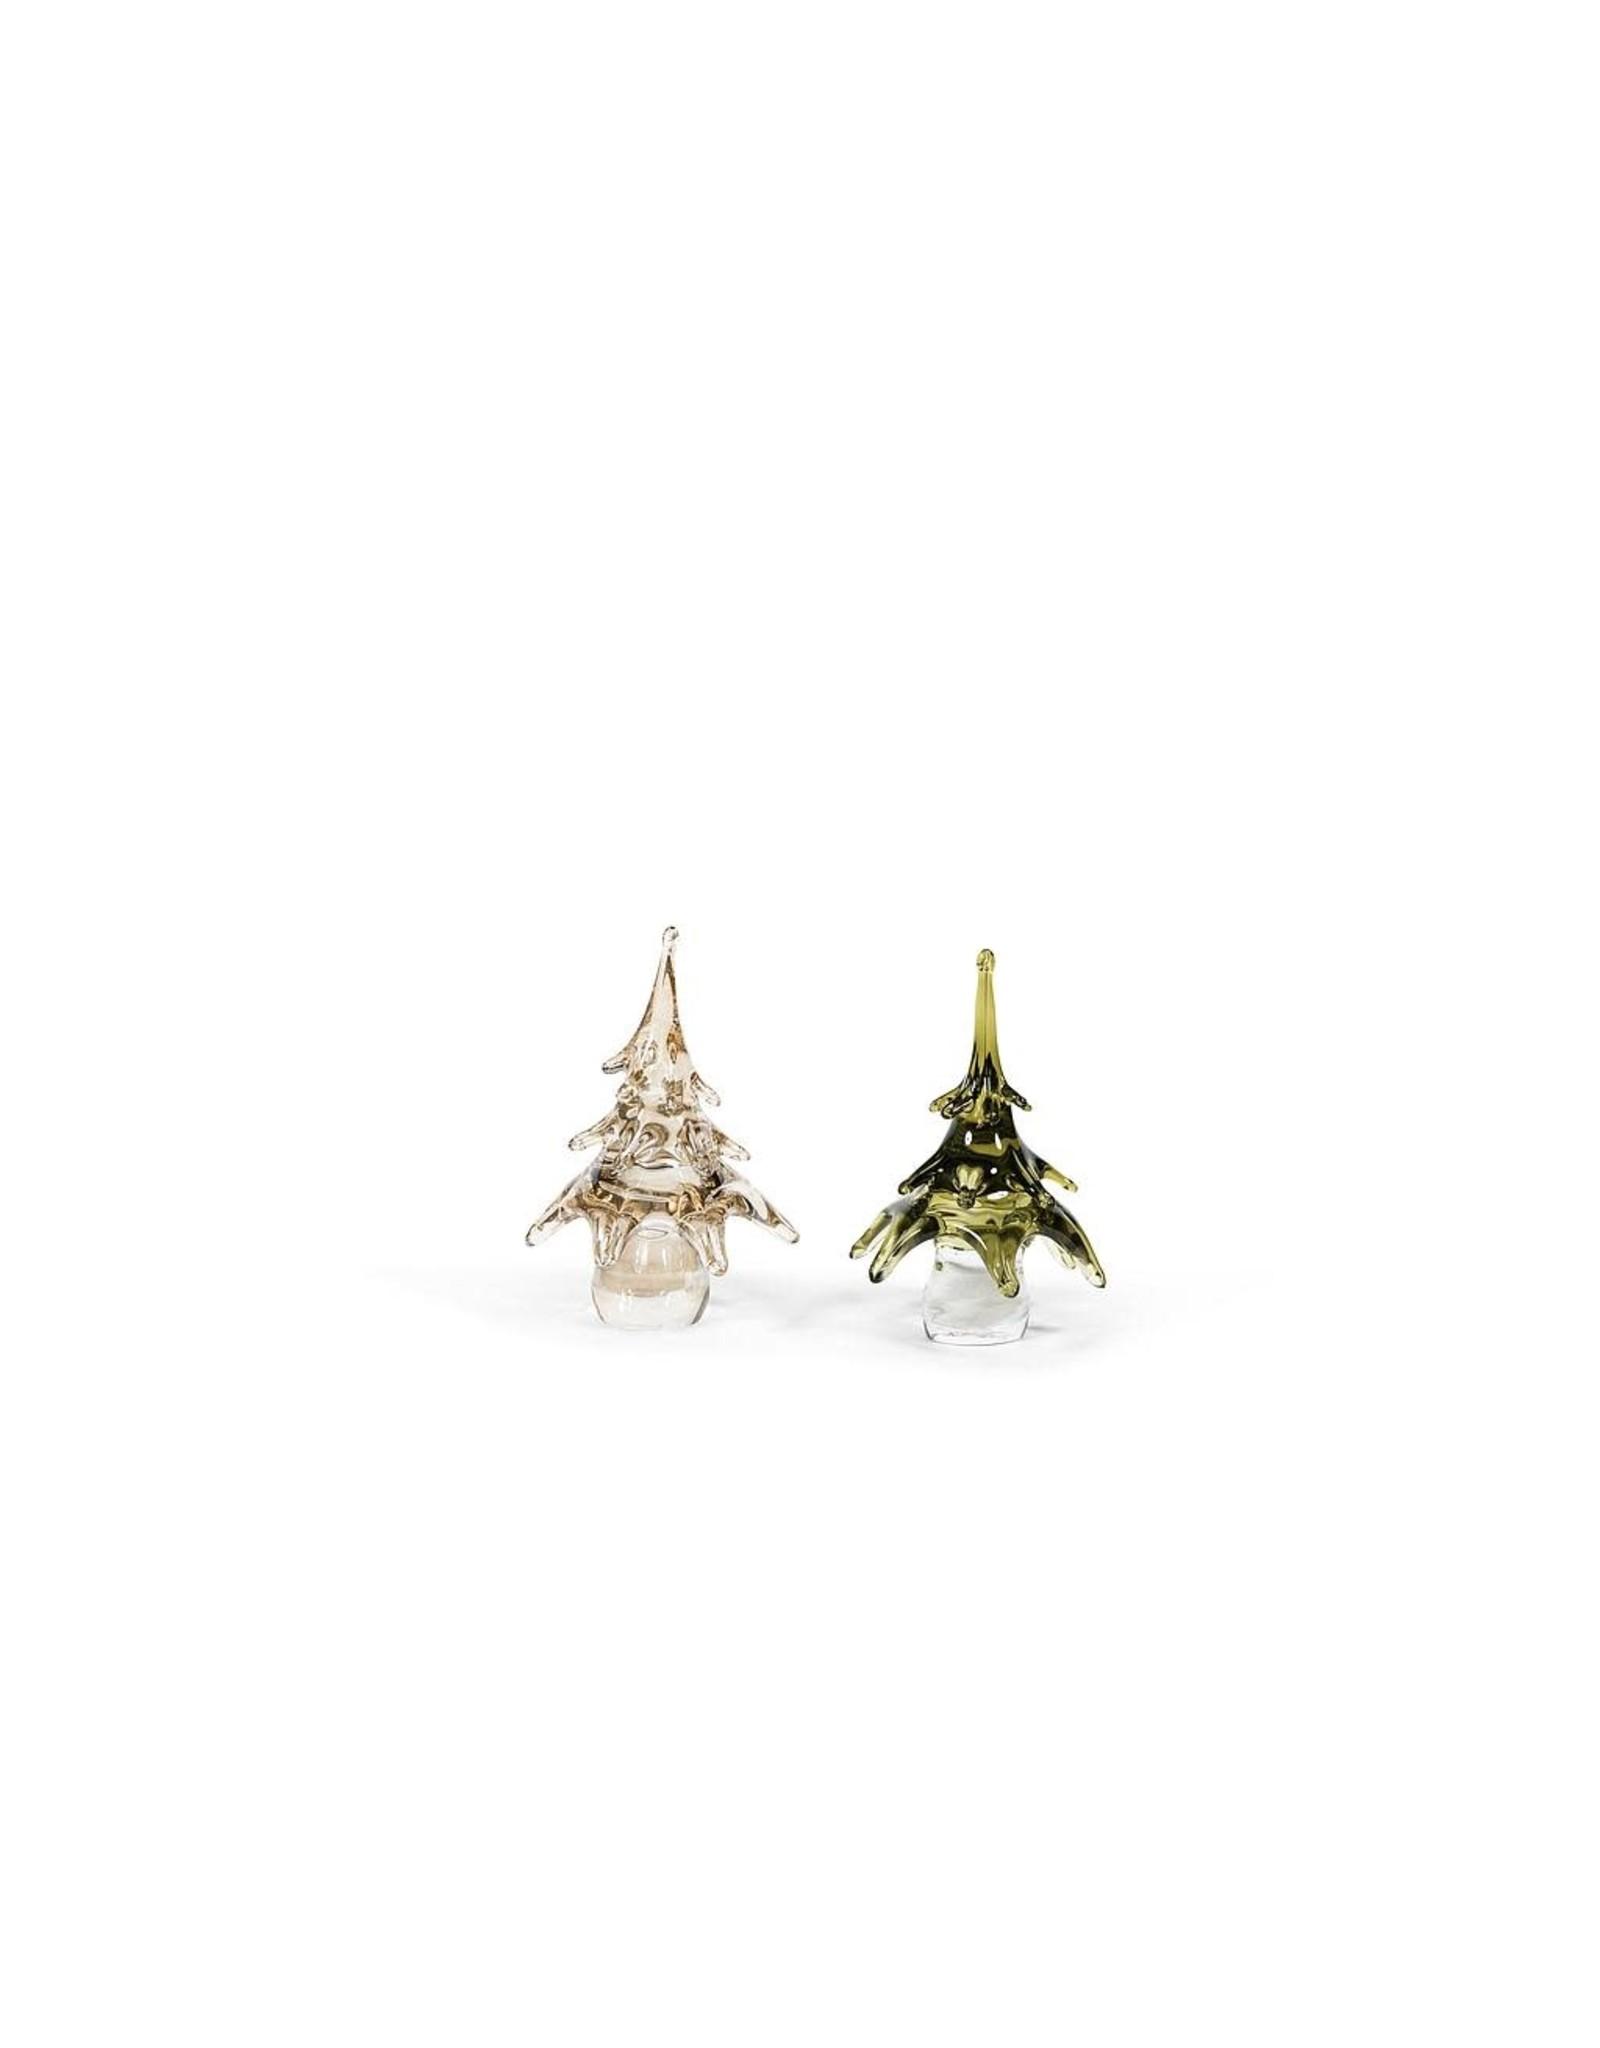 Dekocandle Xmas Tree Glass Oyster Small